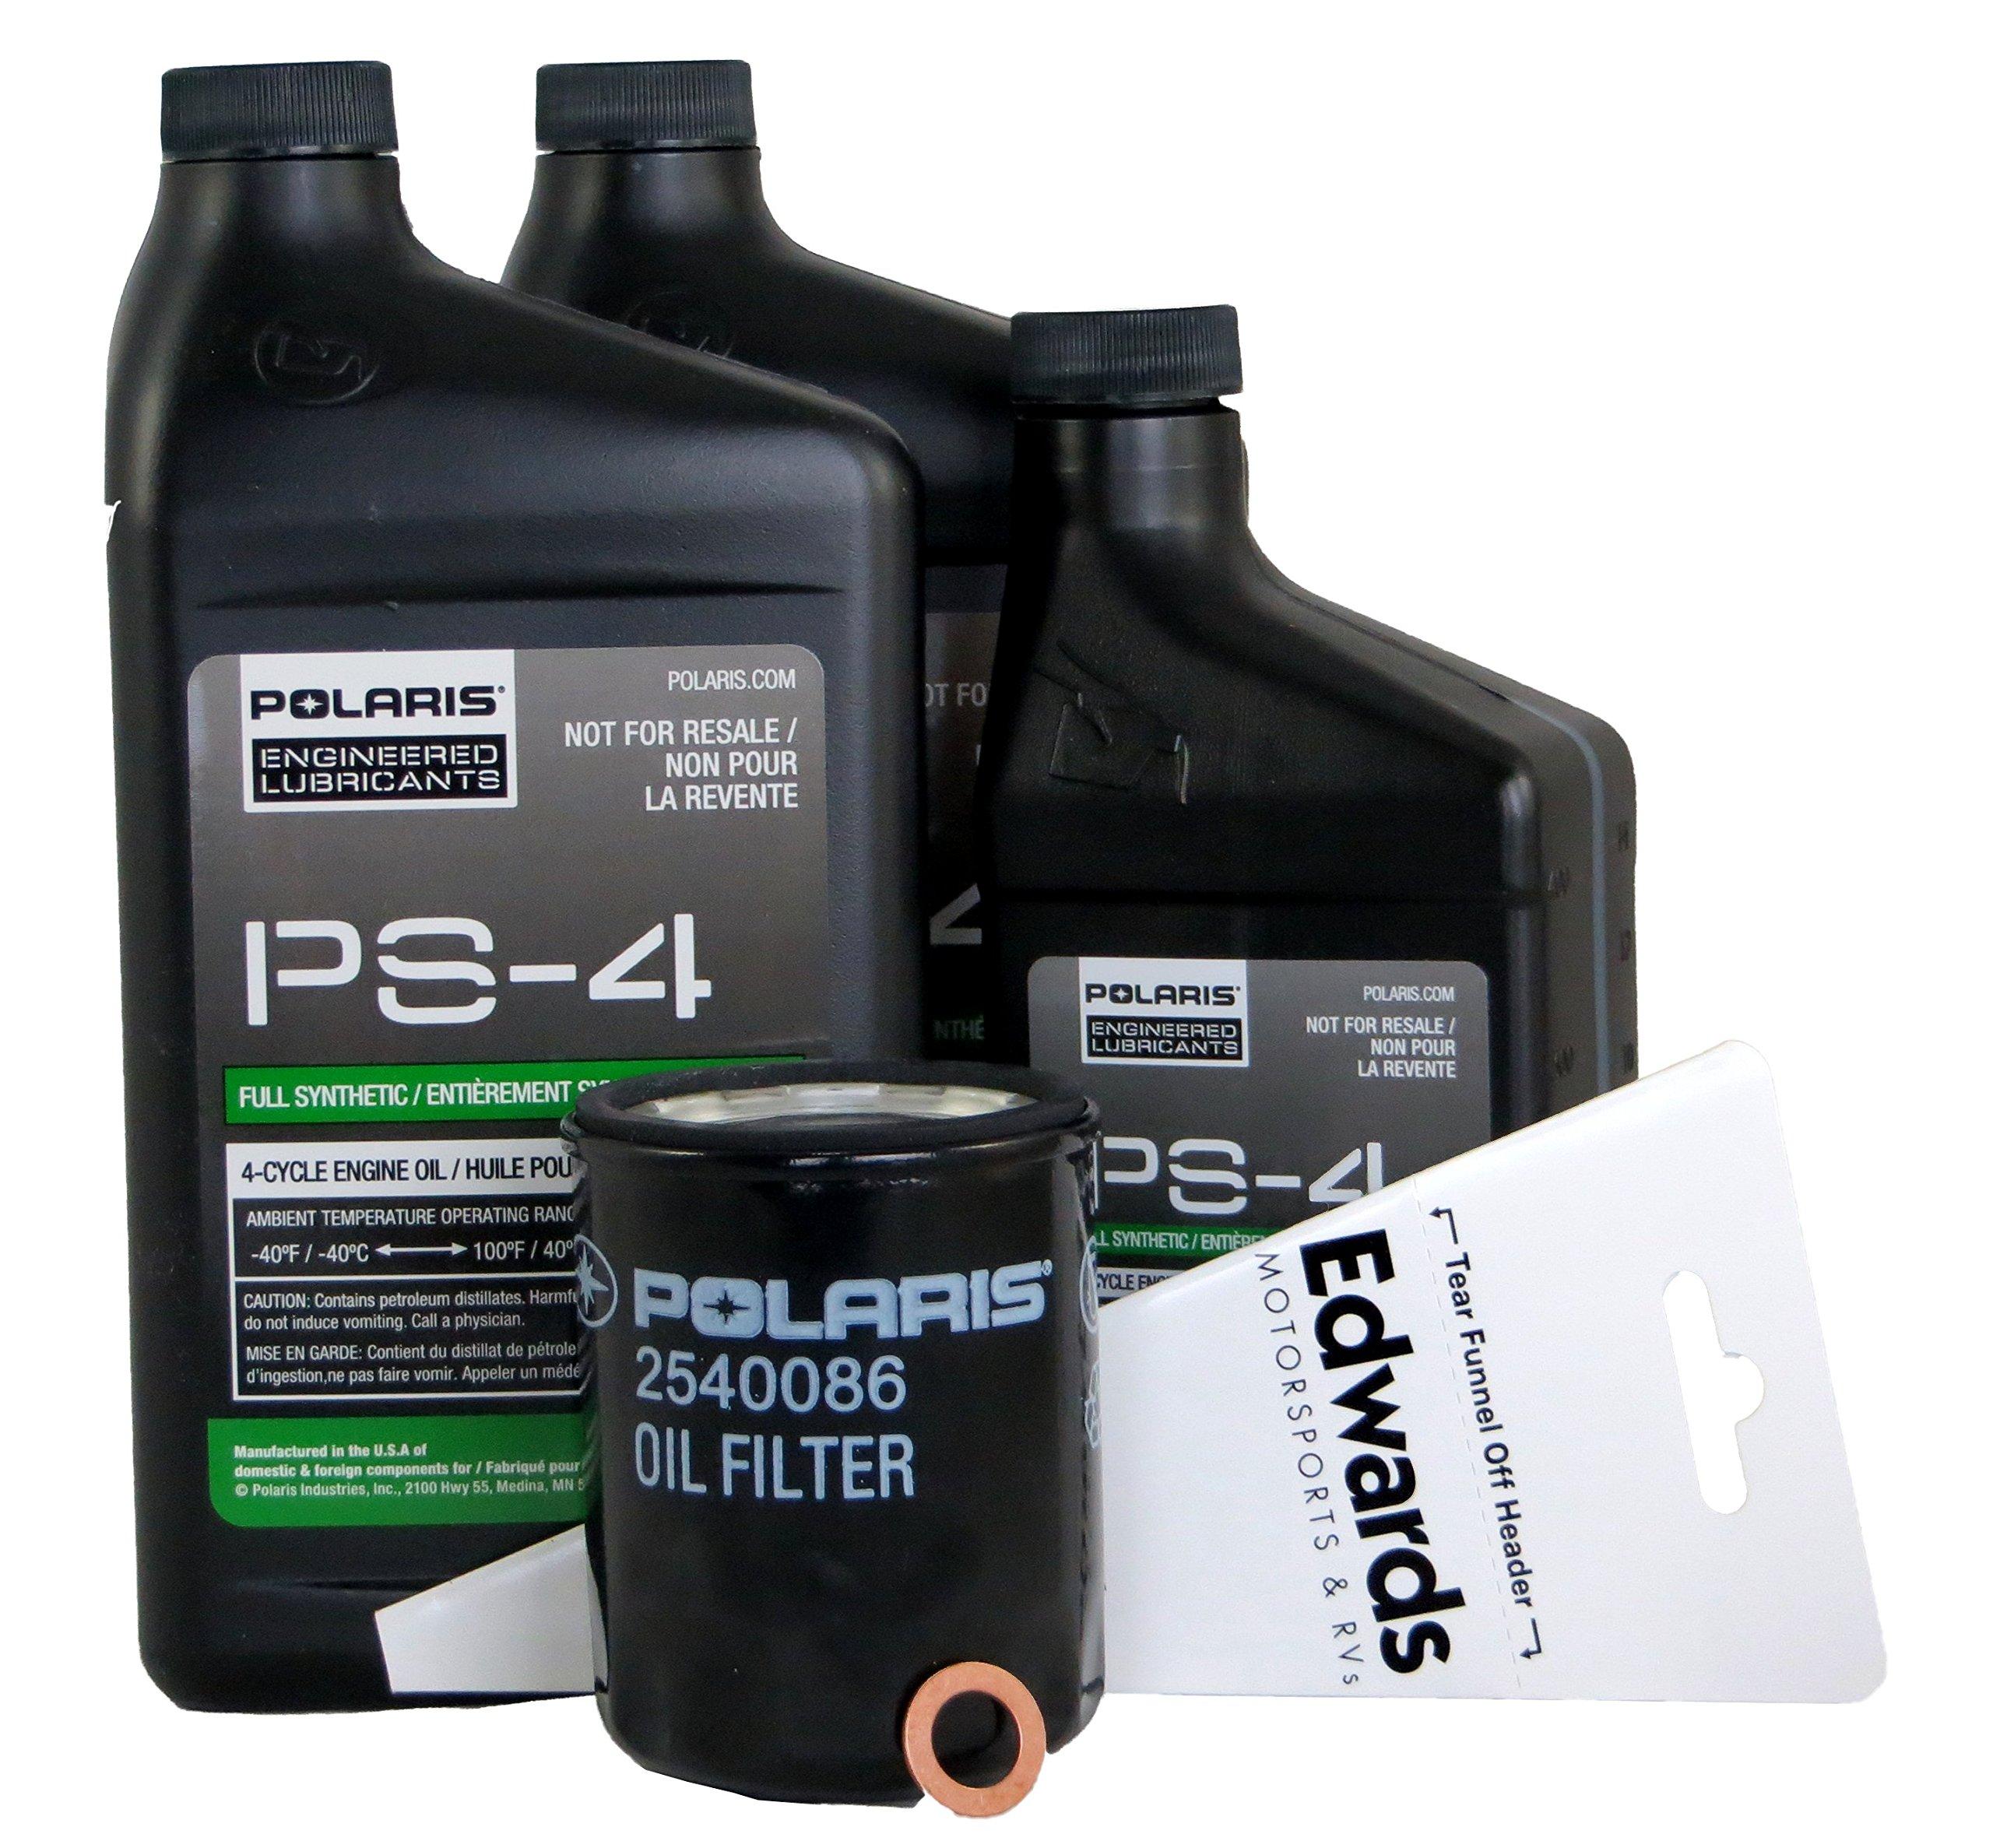 2015 POLARIS RZR XP 1000 OIL CHANGE KIT